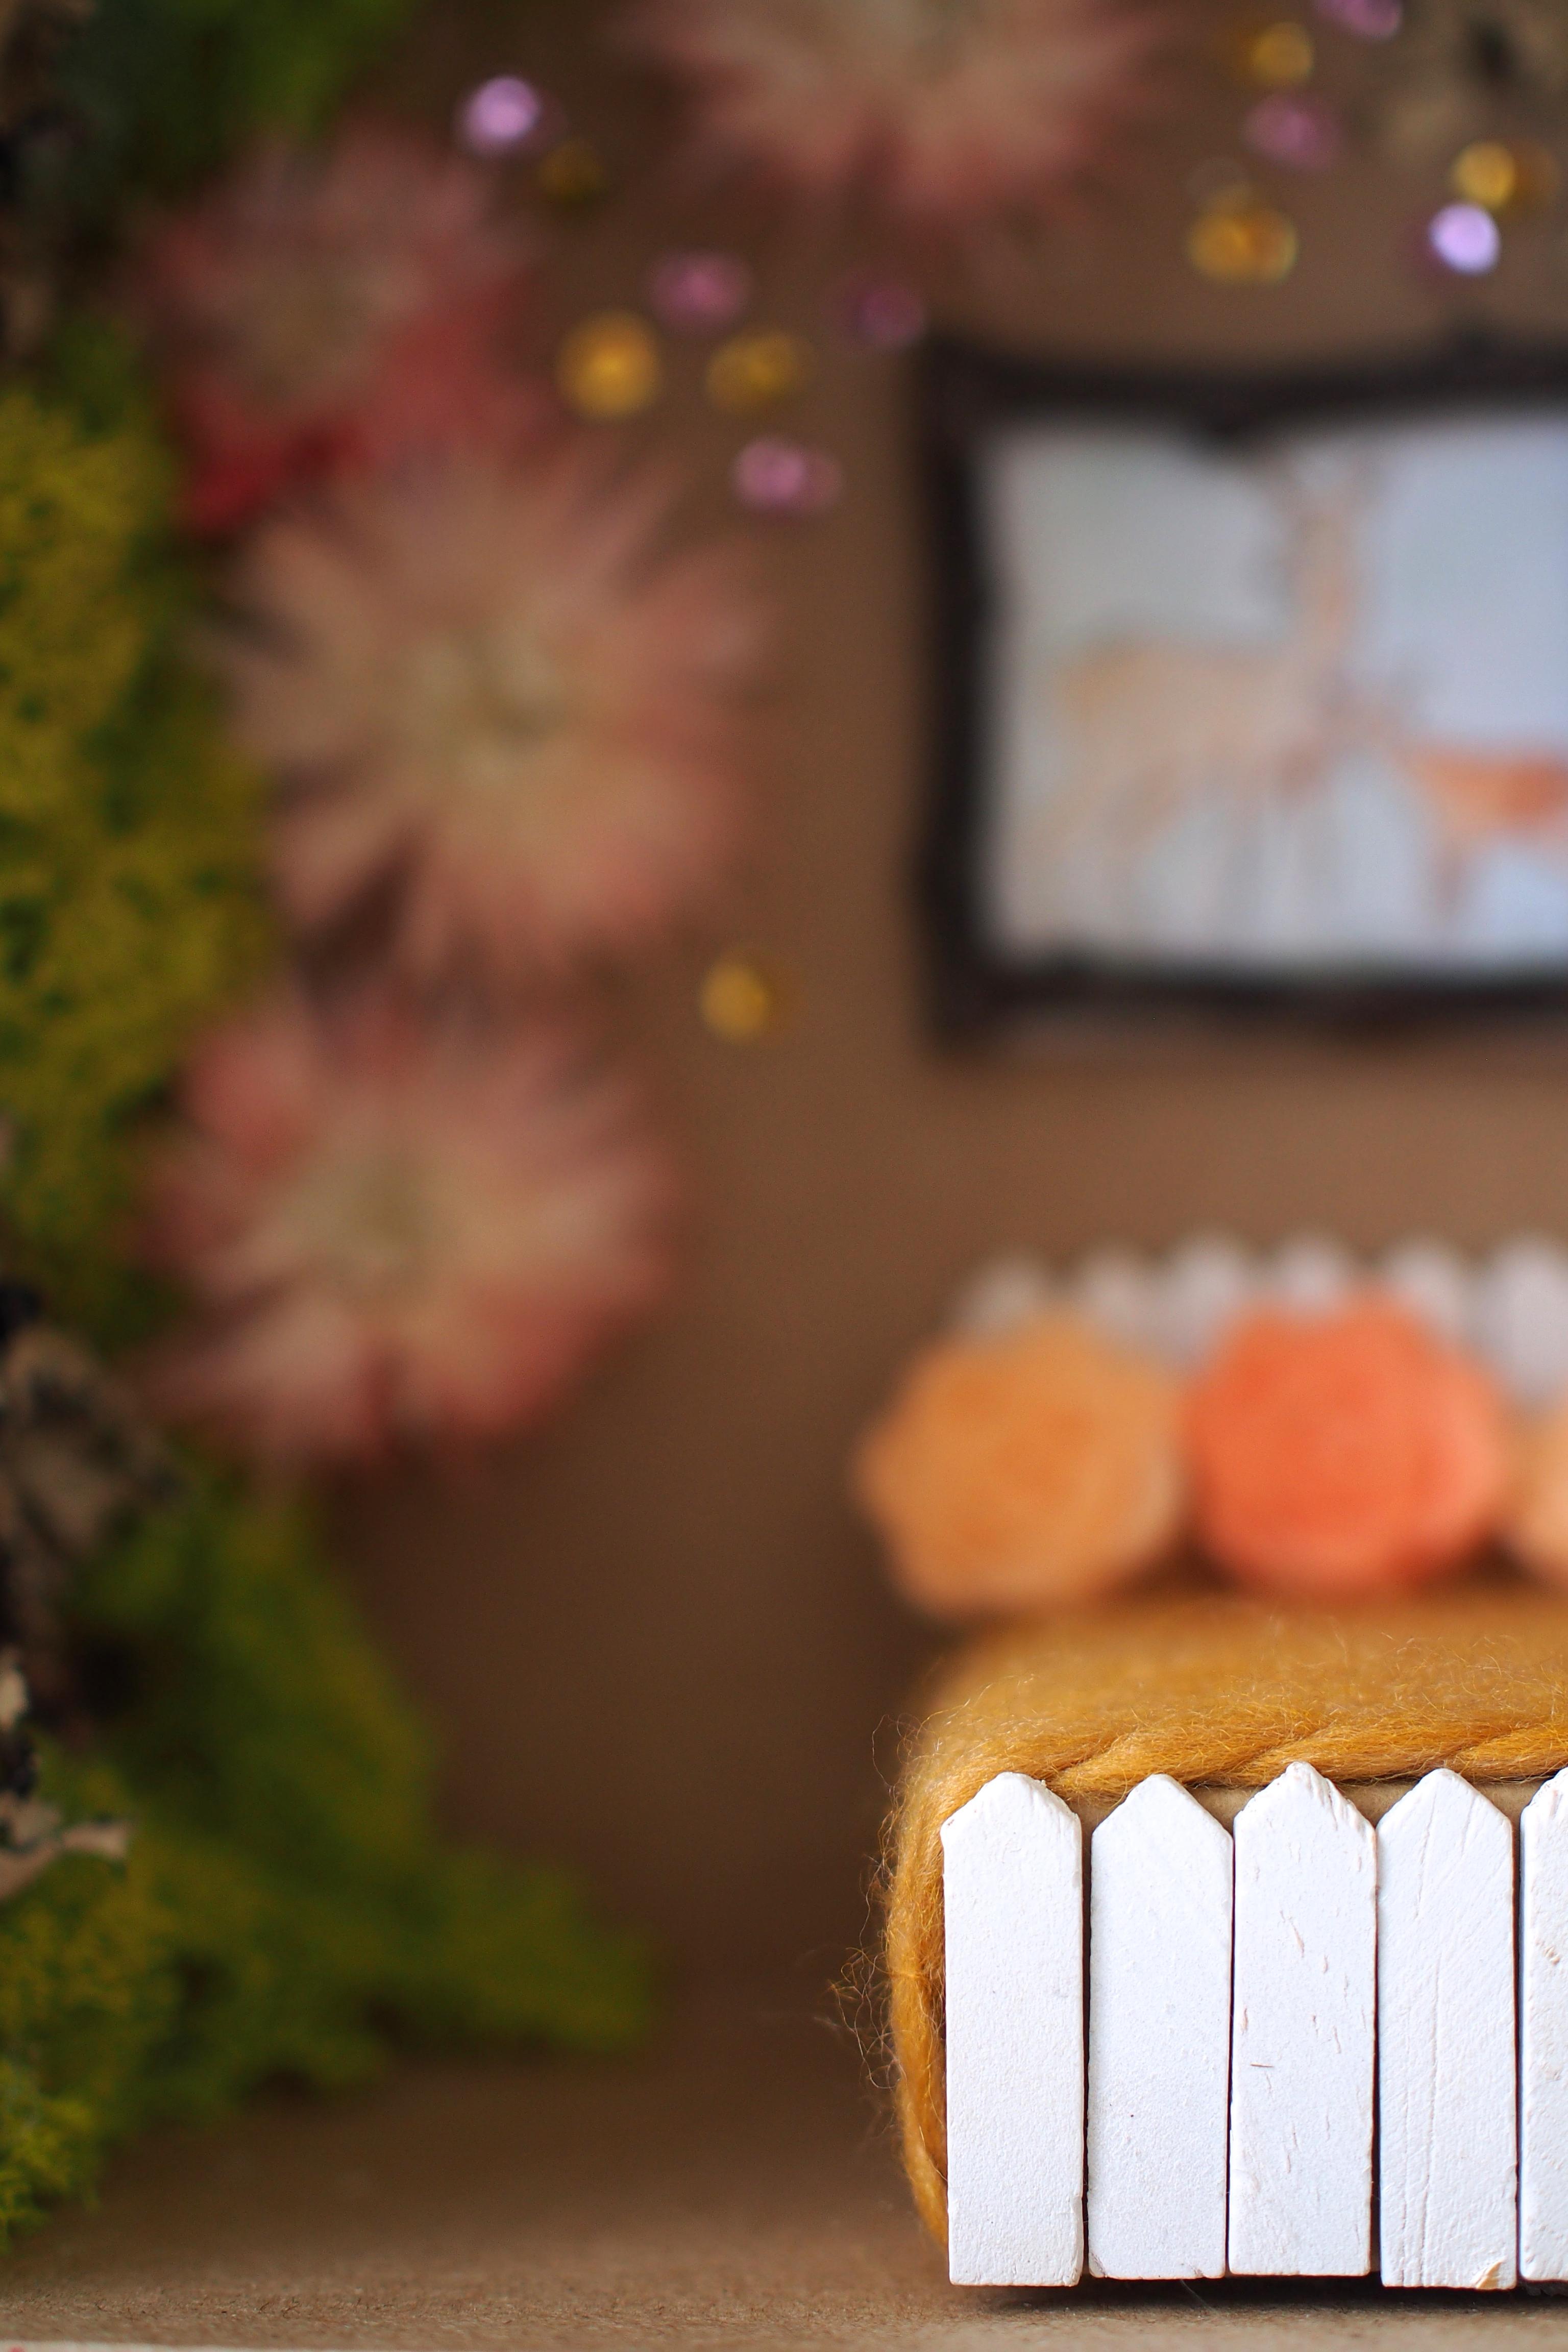 Garden house kit - Themagiconions Com Shop Diy Fairy House Kit Fairy Garden Kit Www